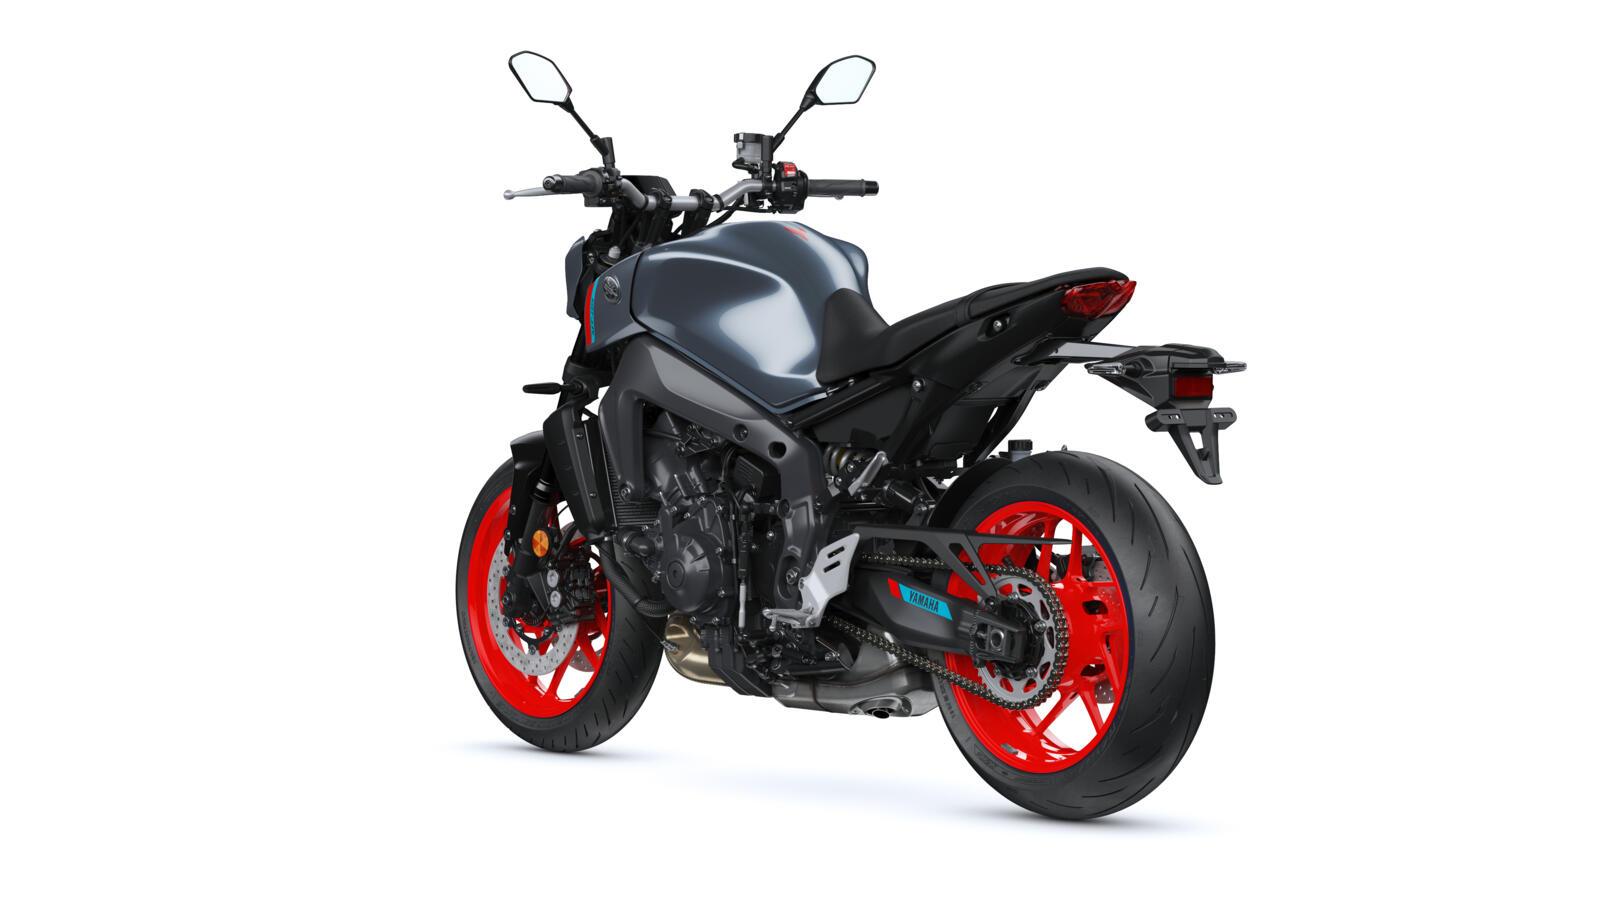 Yamaha MT-09 nu bestellen